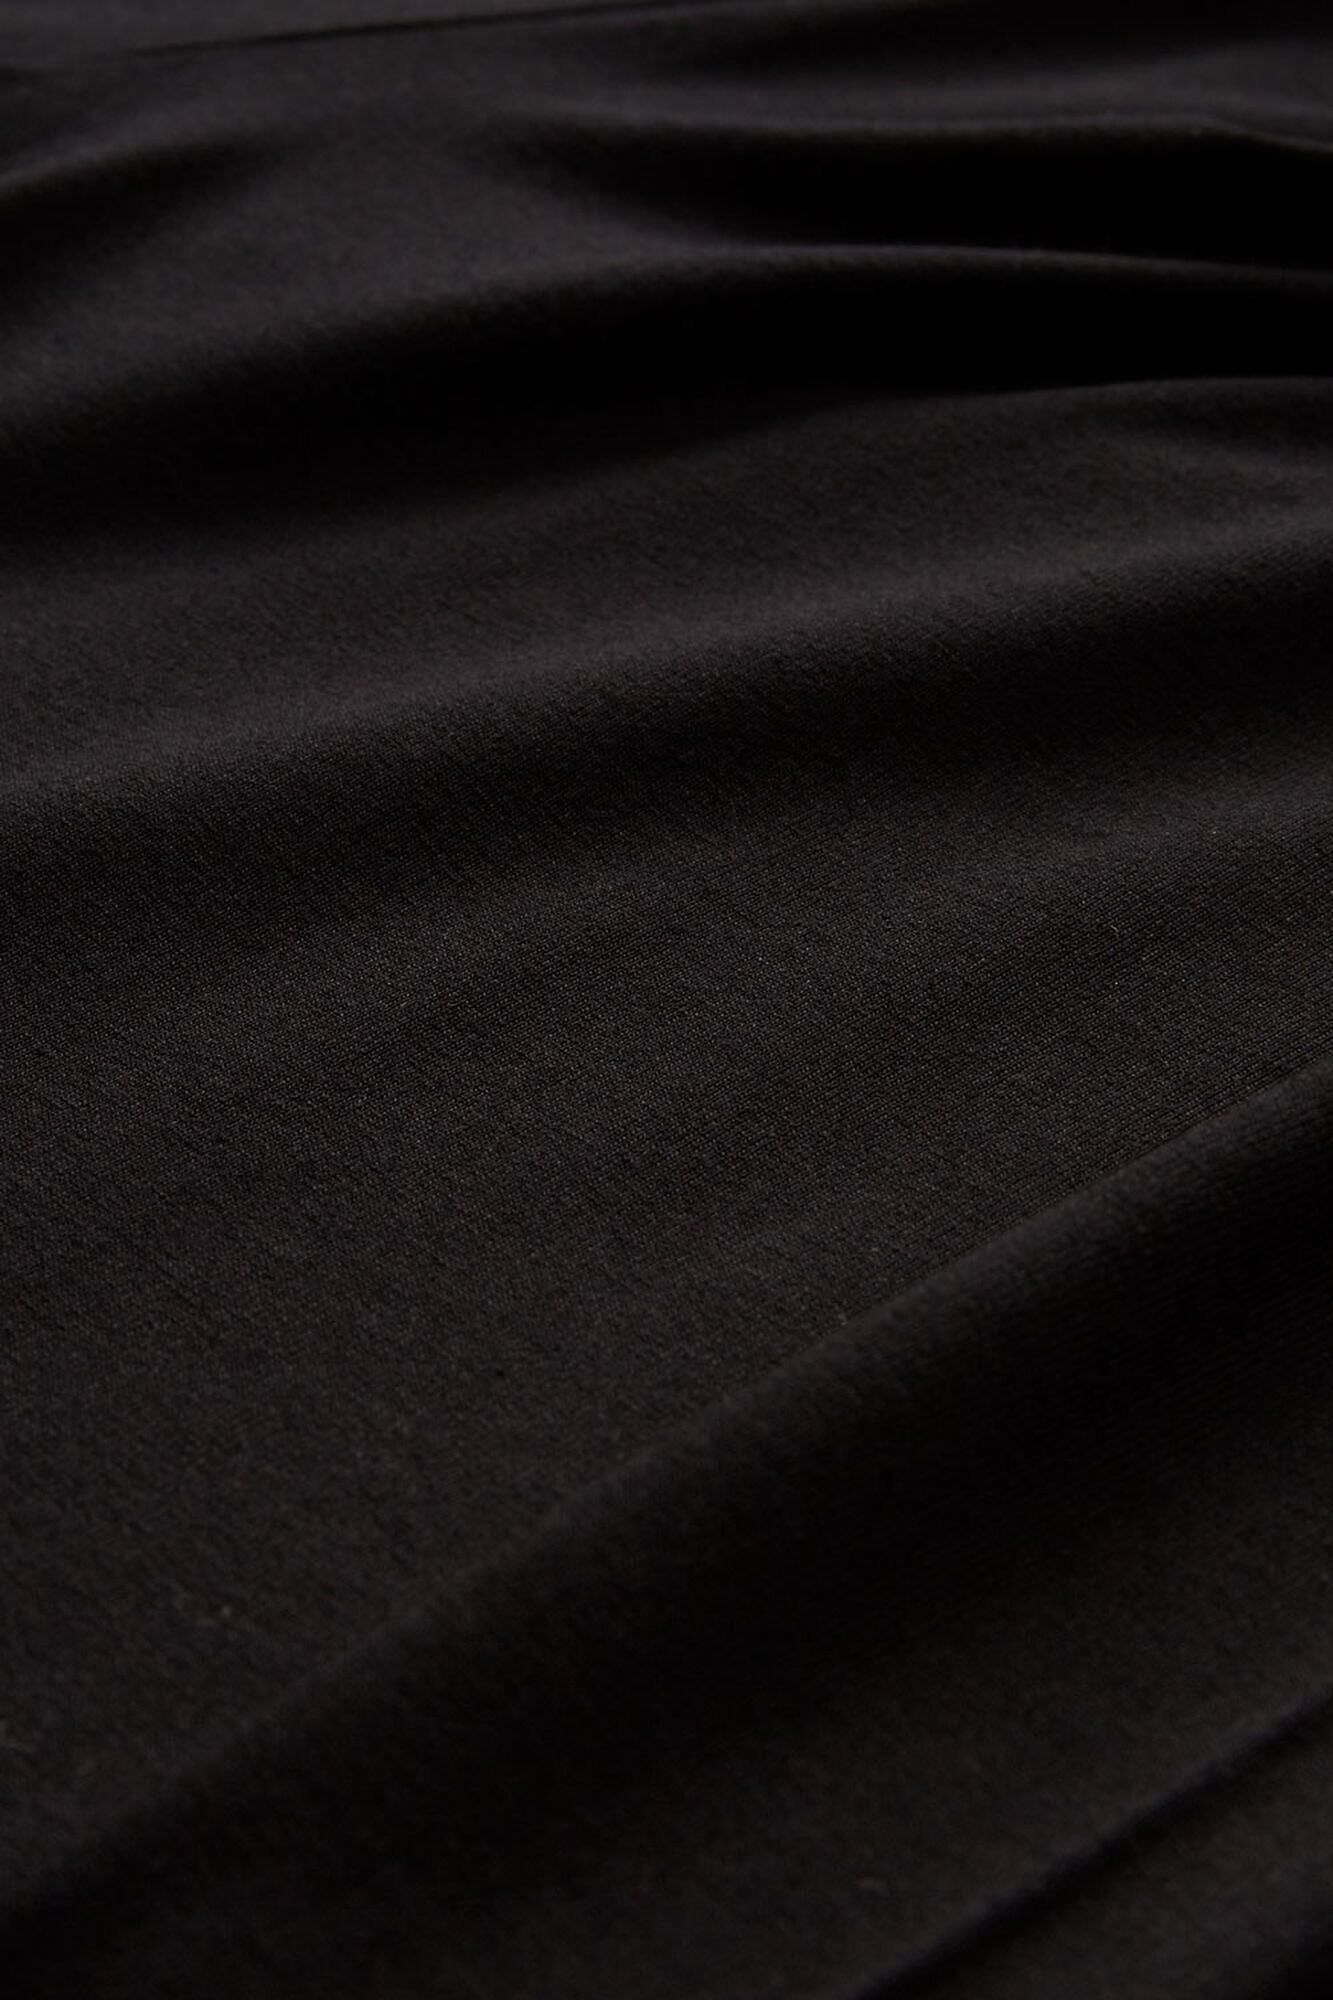 PENNIE LEGGINGS, Black, hi-res